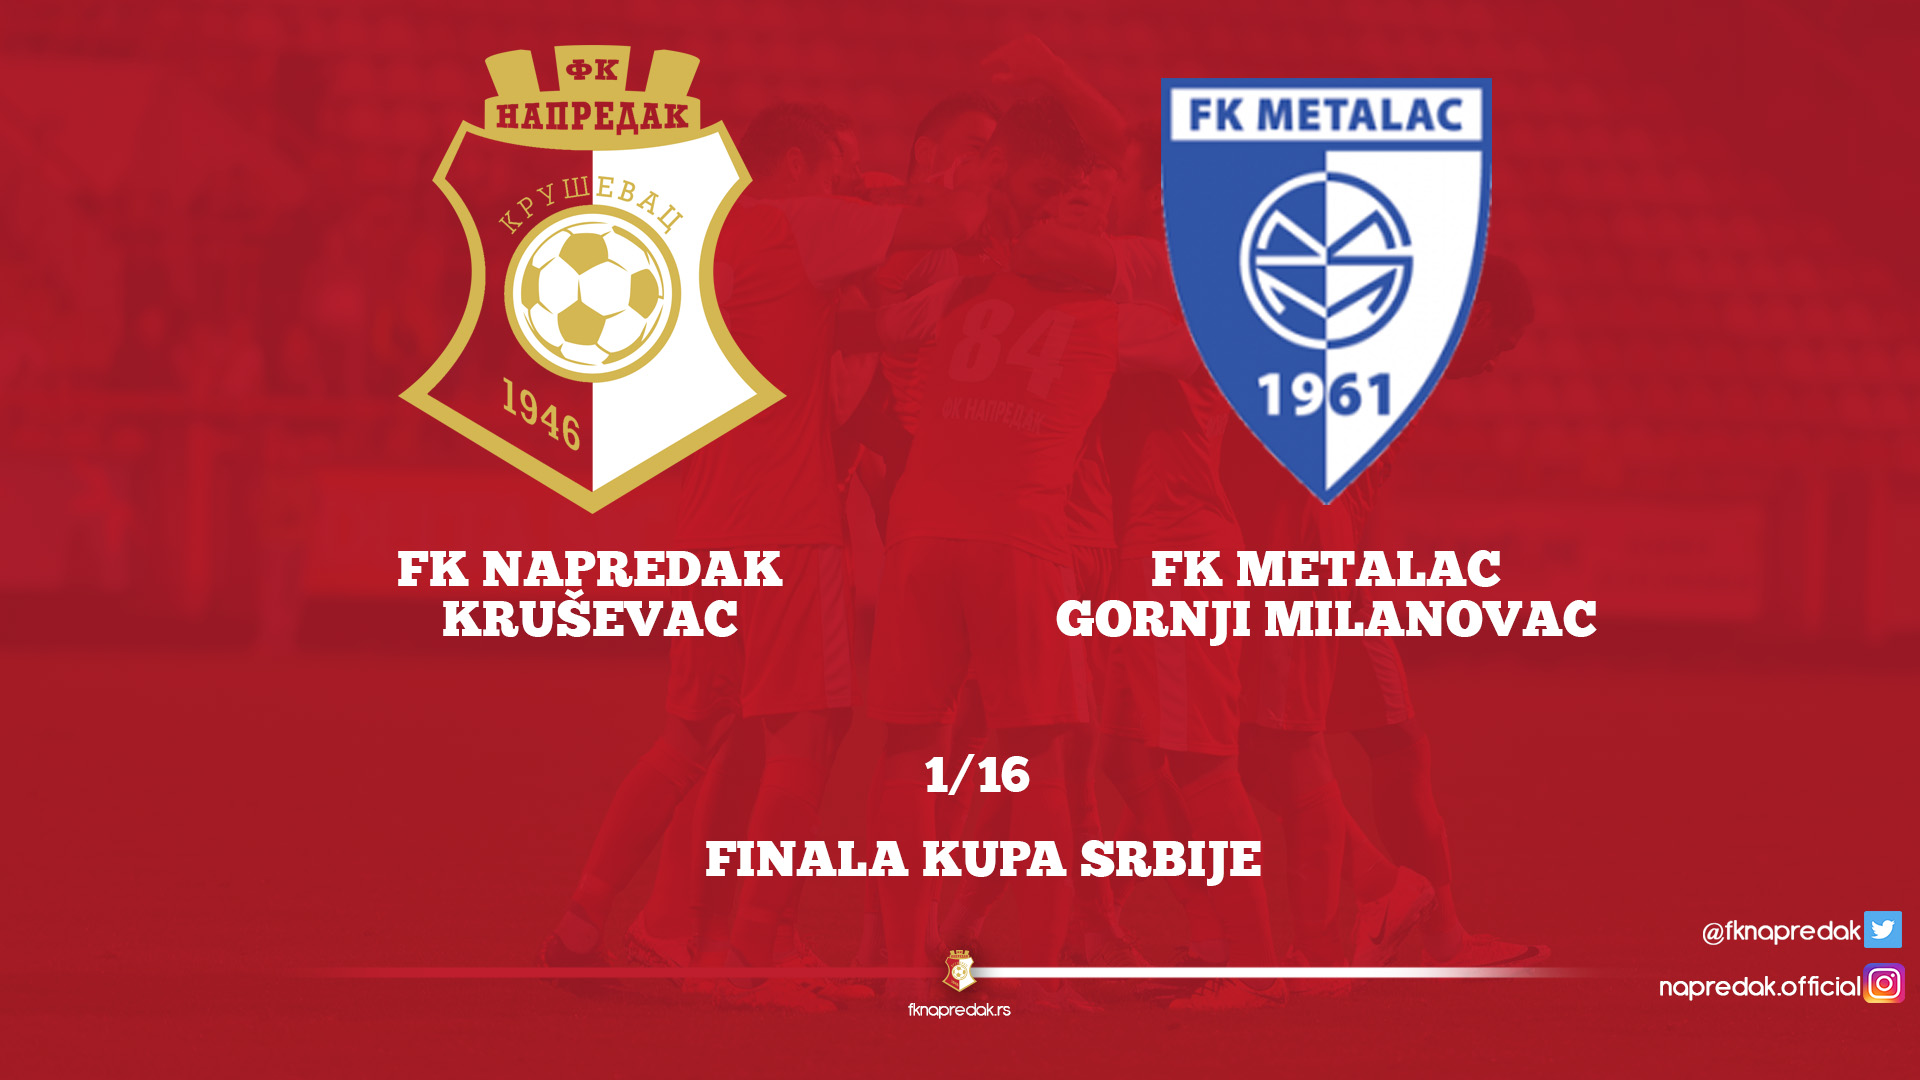 CUP: Napredak F.C. - Metalac F.C 2:0